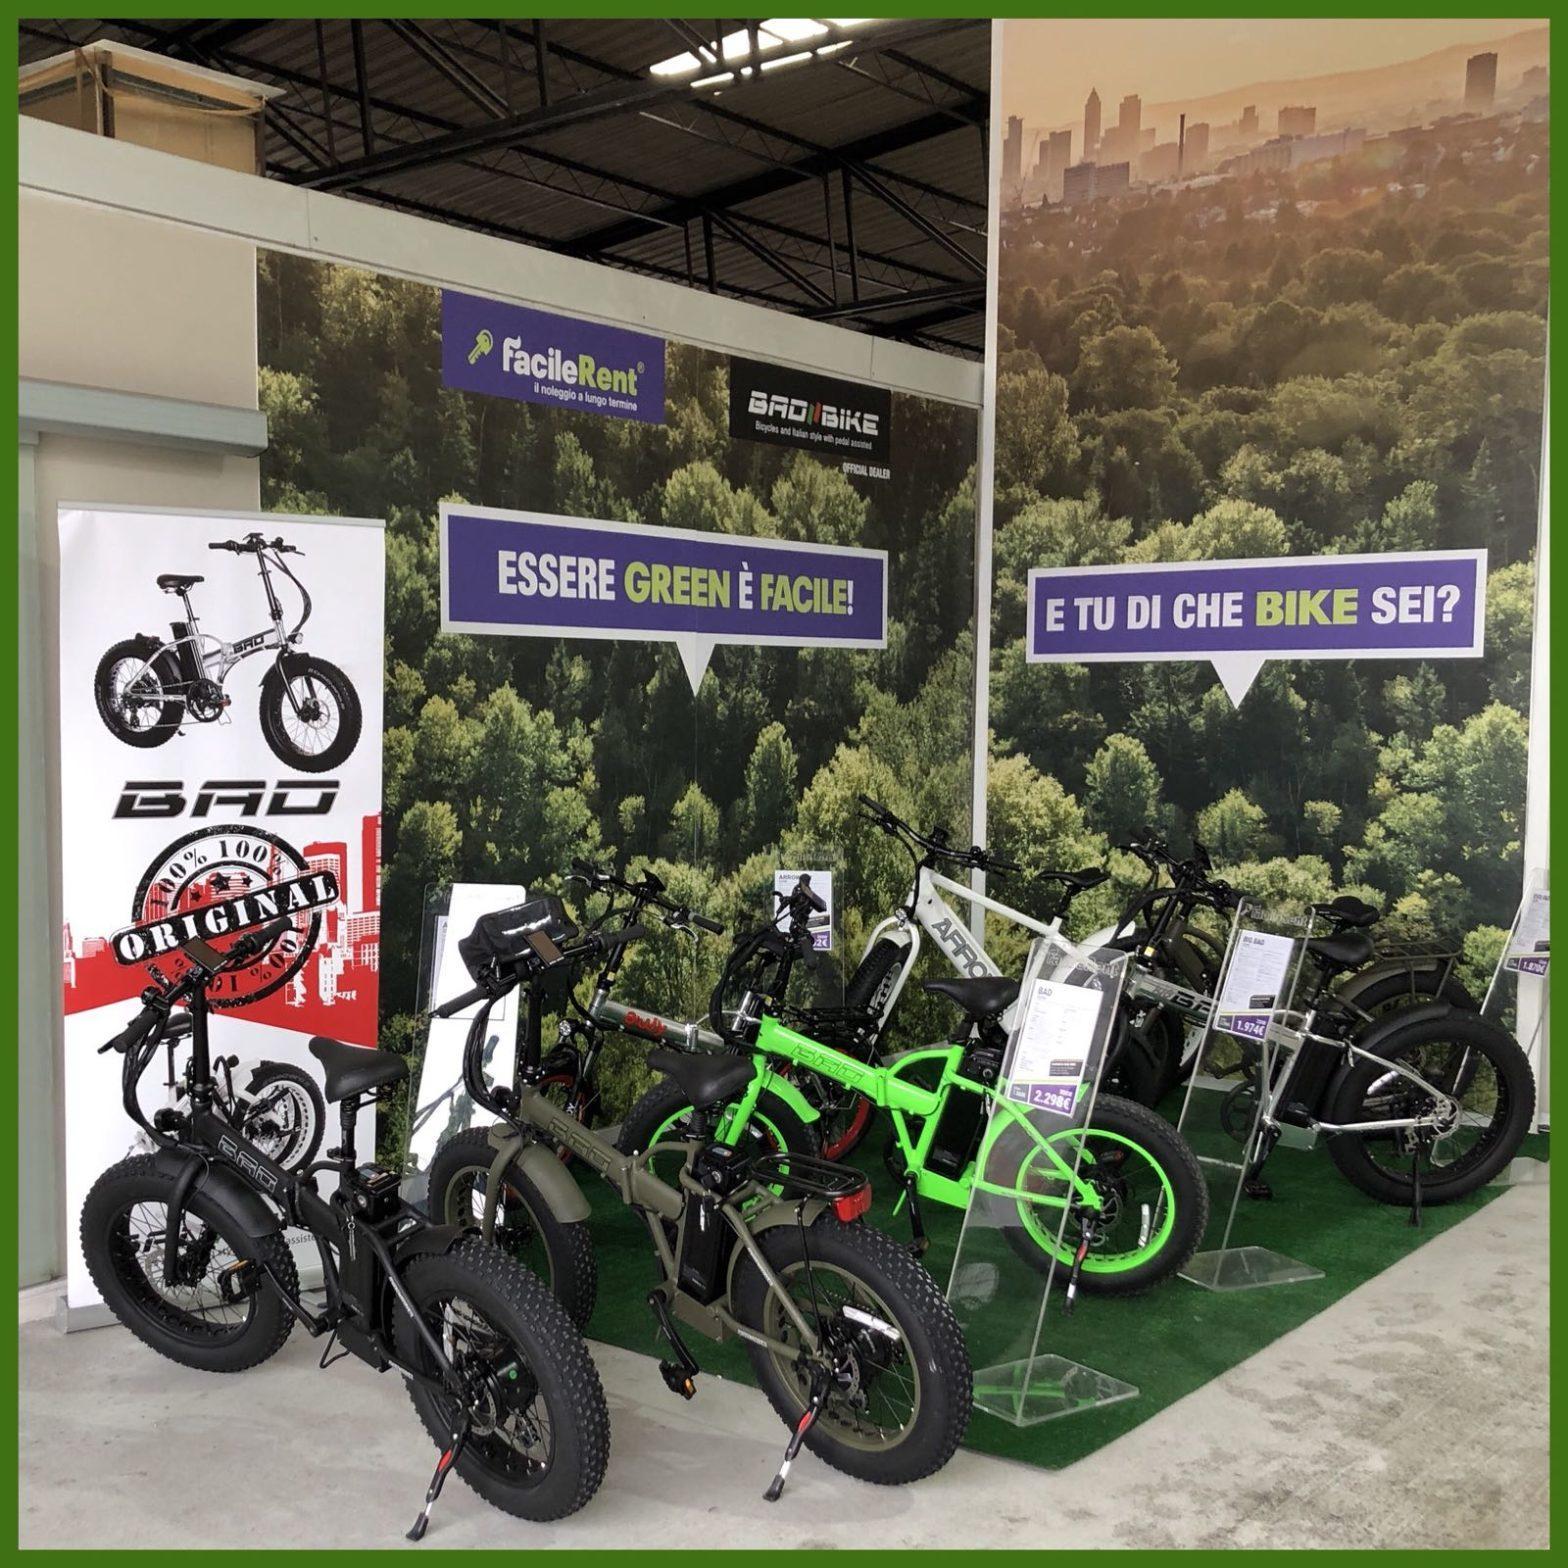 FacileRent è il nuovo Official Dealer Bad Bike